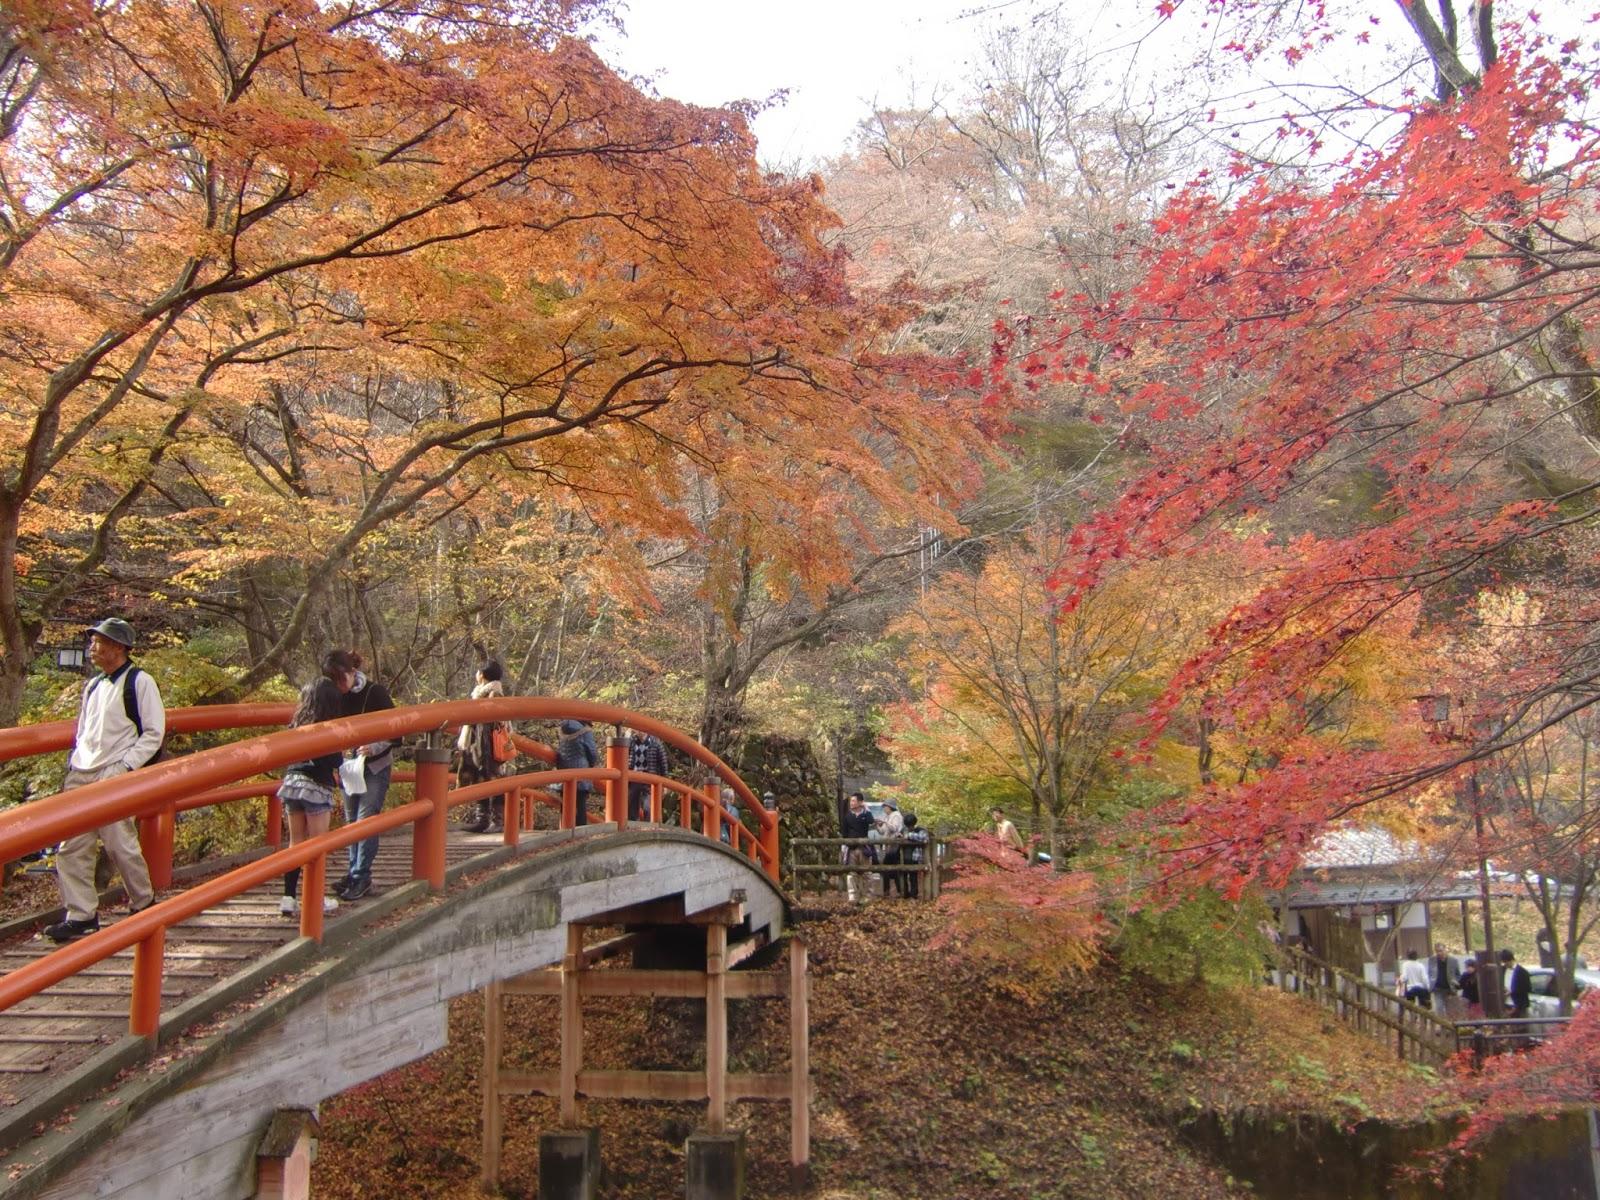 Japanese roten buro 1 9